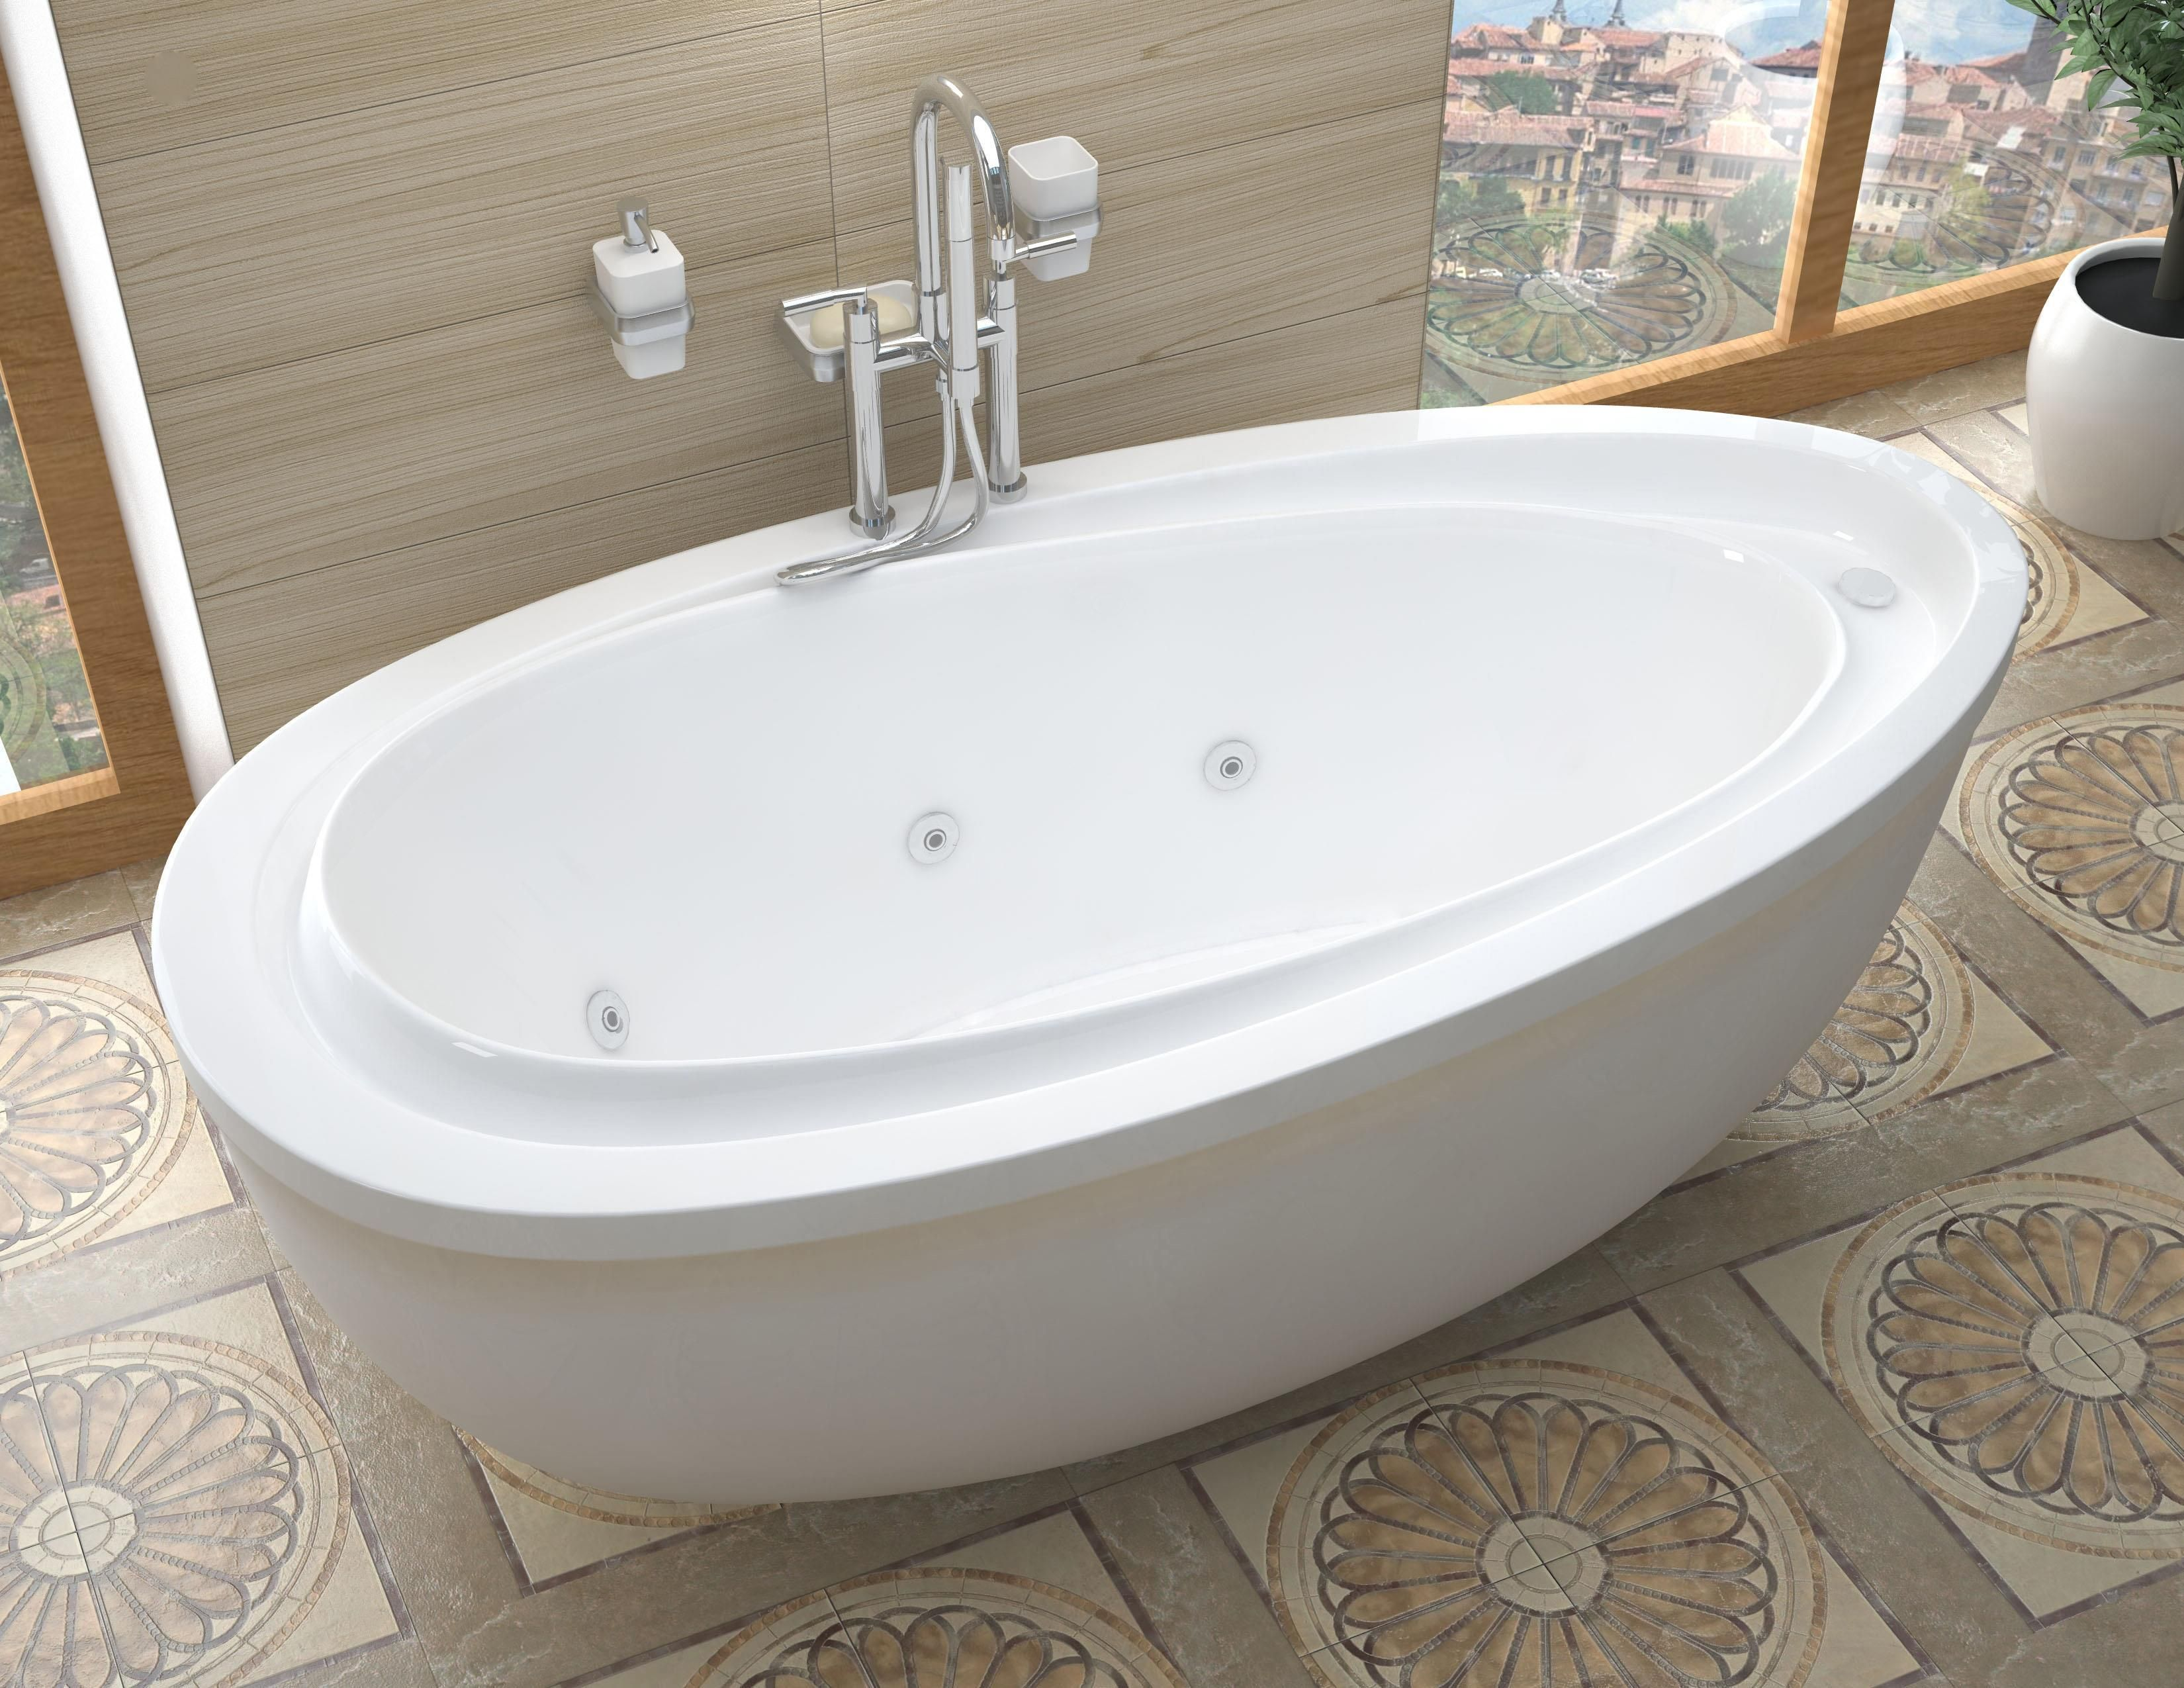 Venzi Tullia 38 x 71 x 20 Oval Freestanding Whirlpool Jetted Bathtub ...